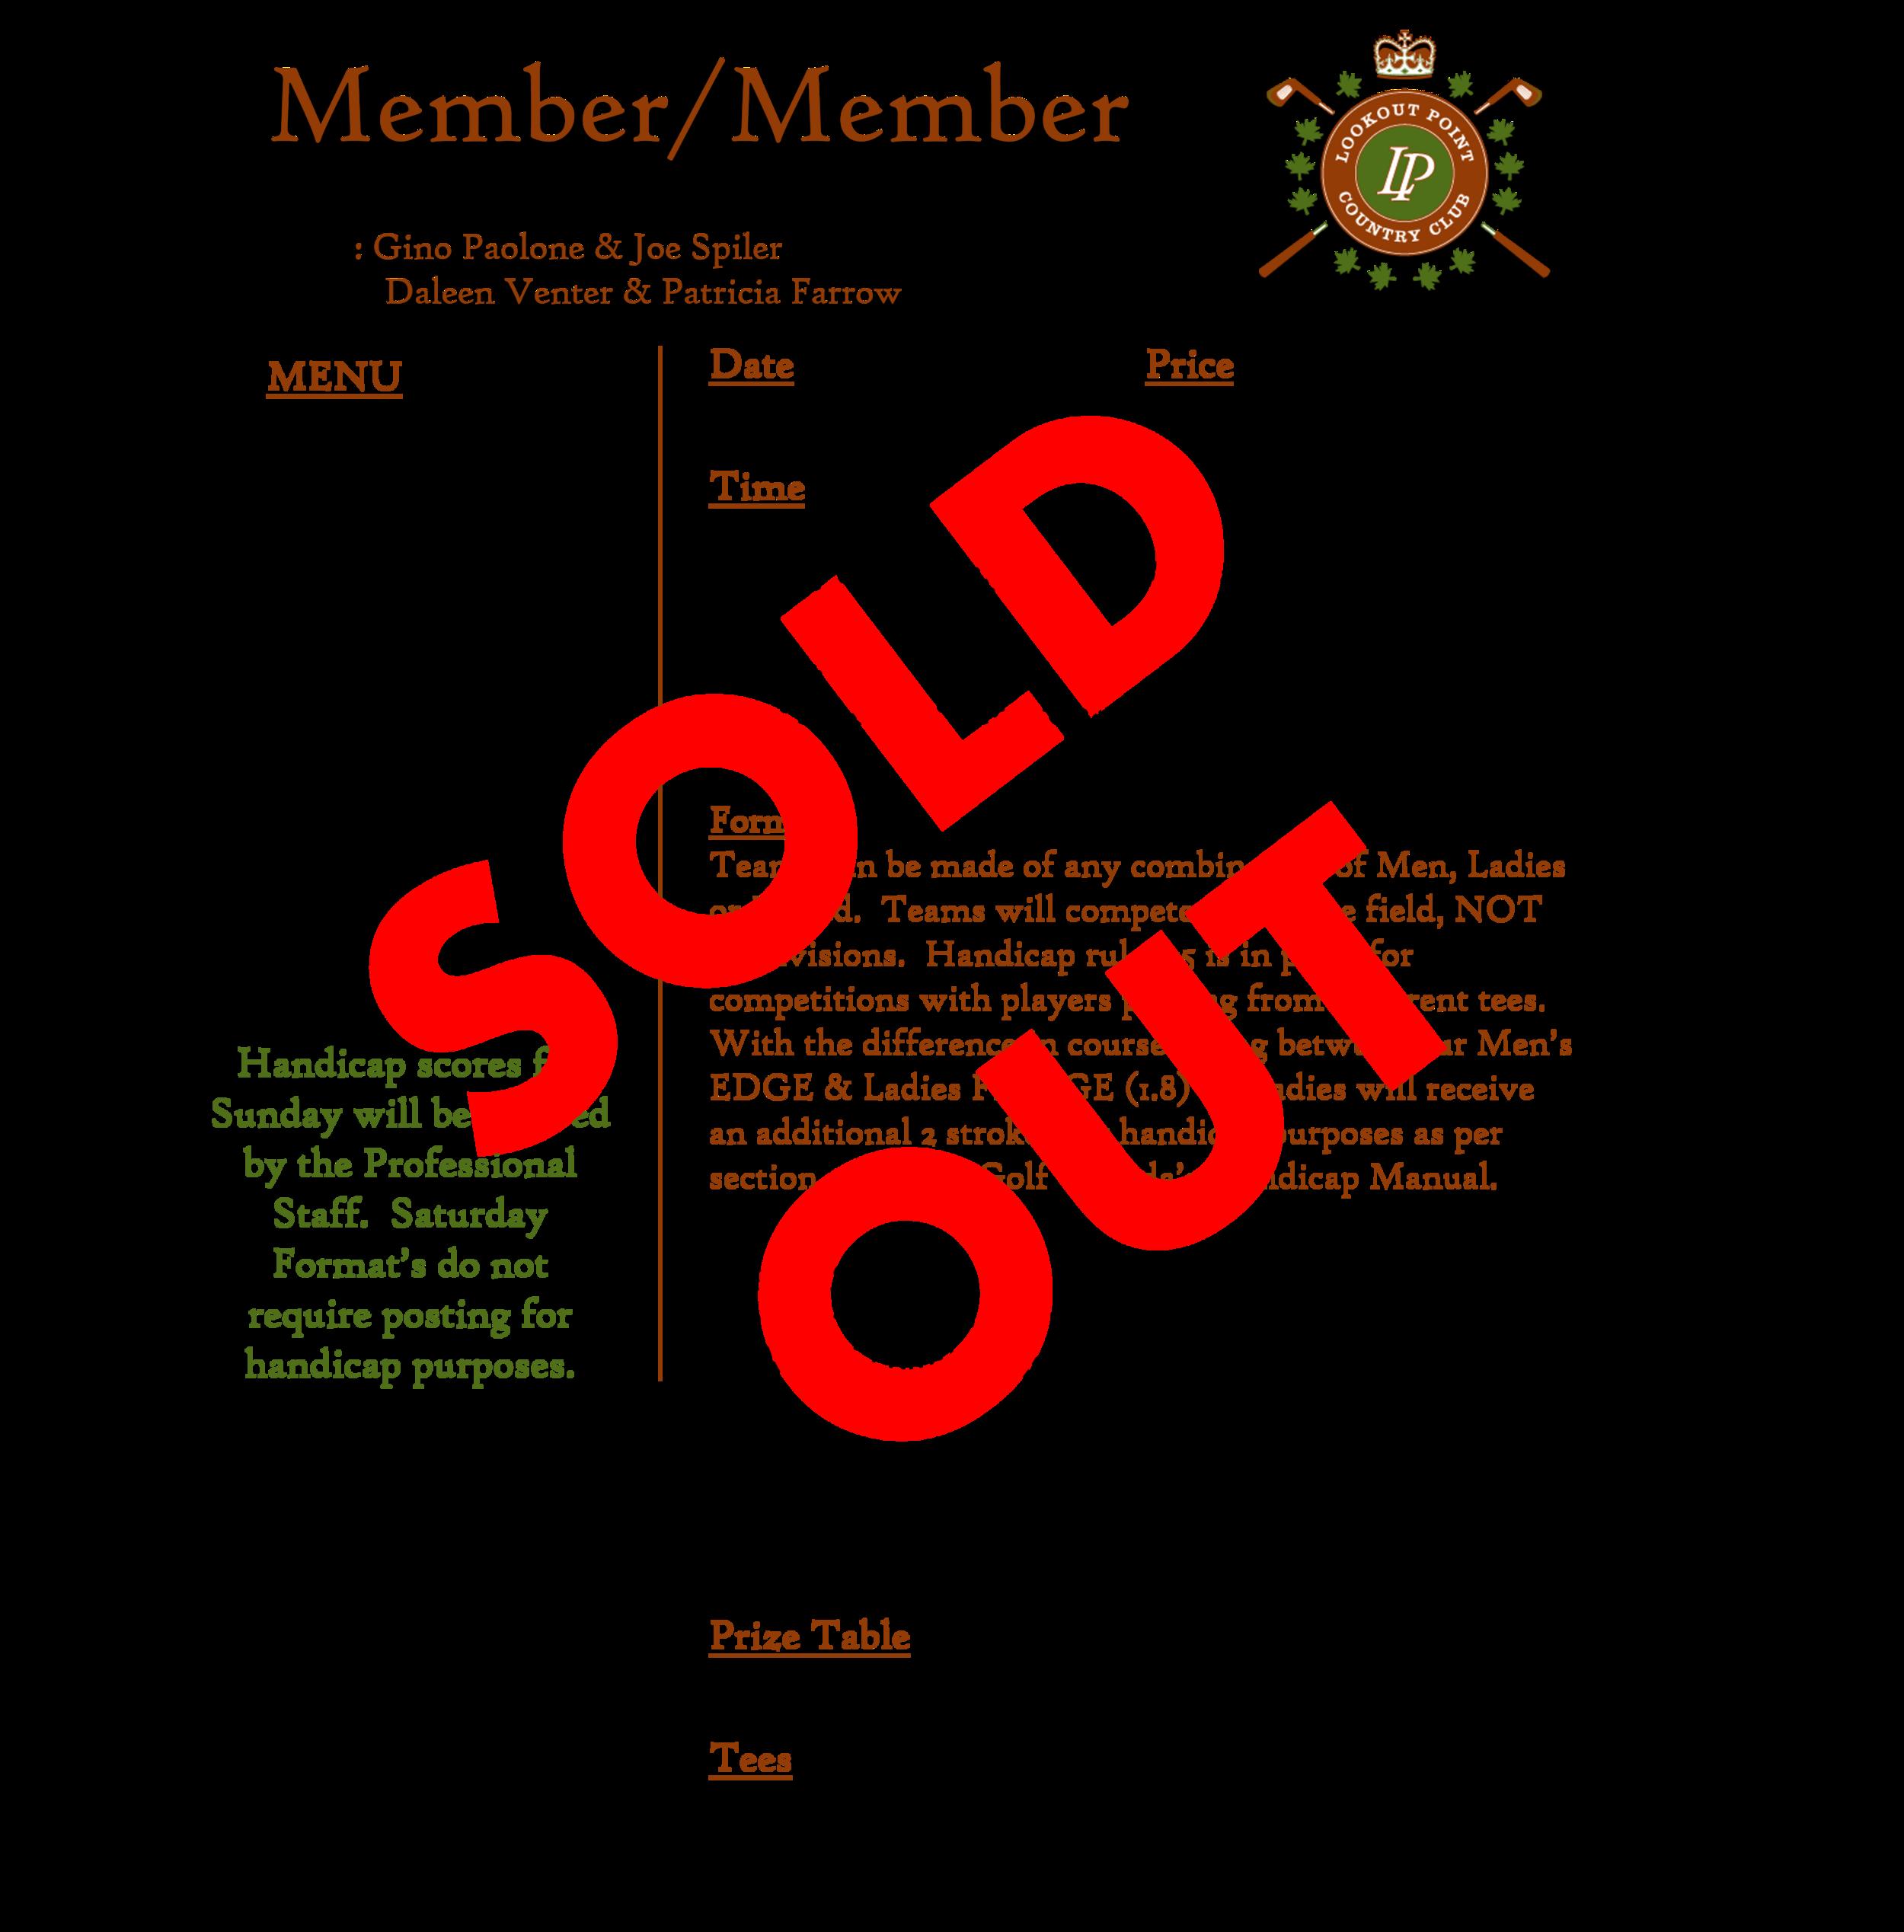 member member sold out.png